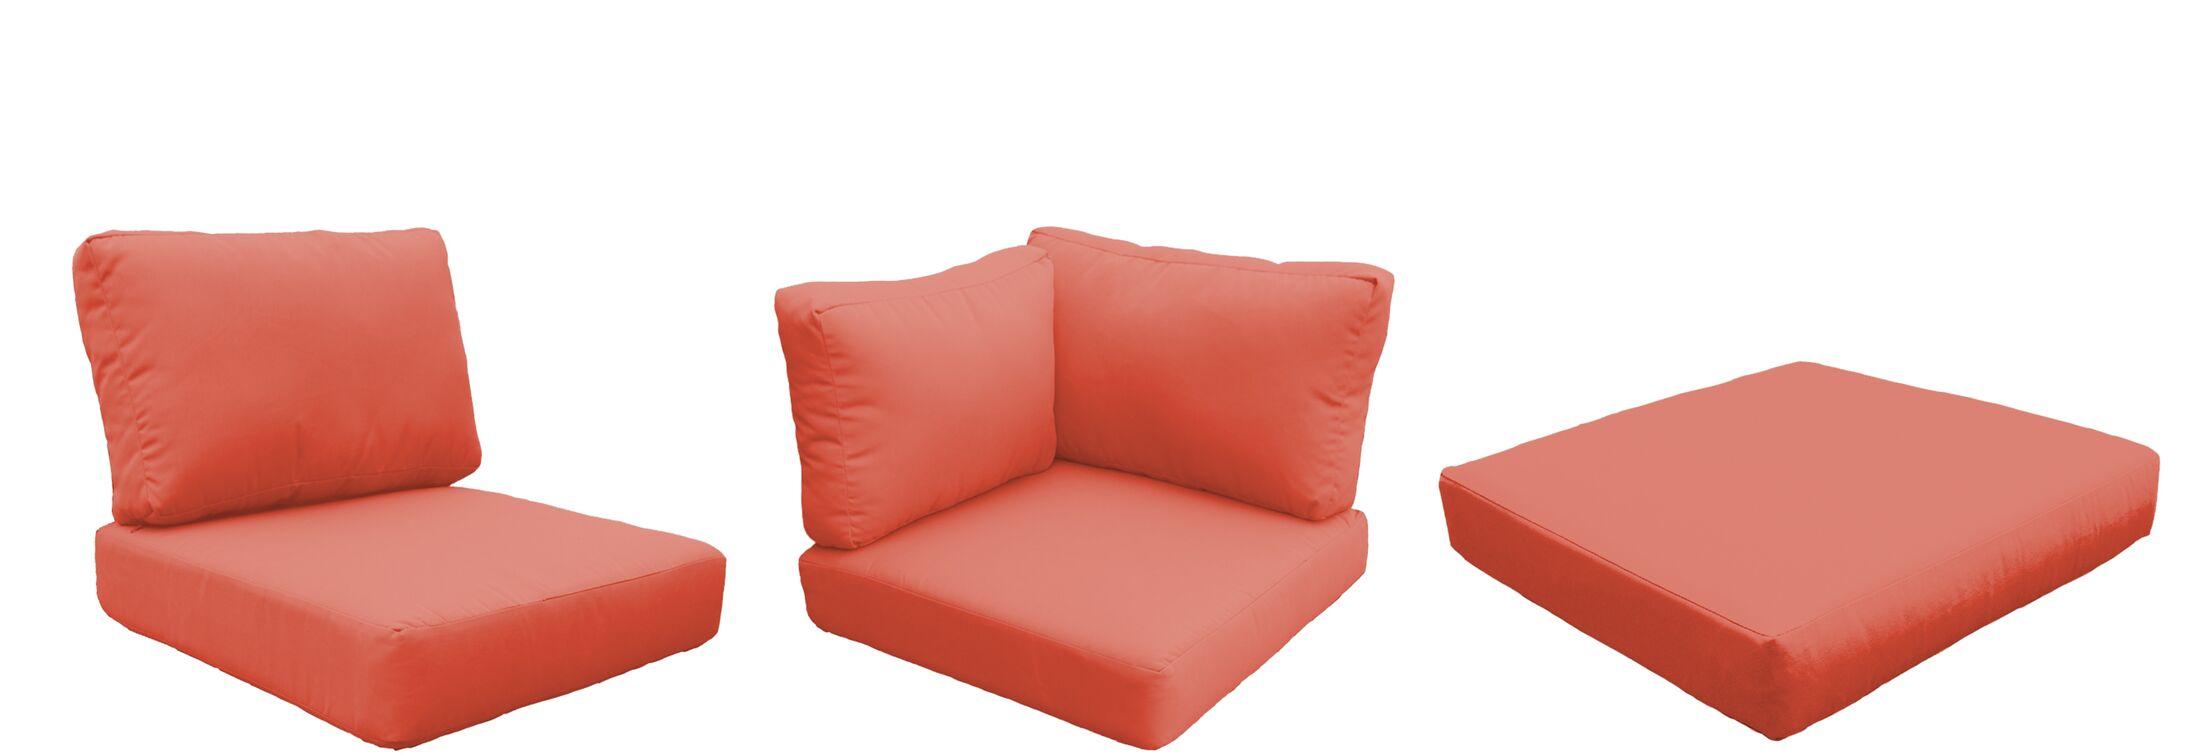 Eldredge Outdoor 16 Piece Lounge Chair Cushion Set Fabric: Tangerine